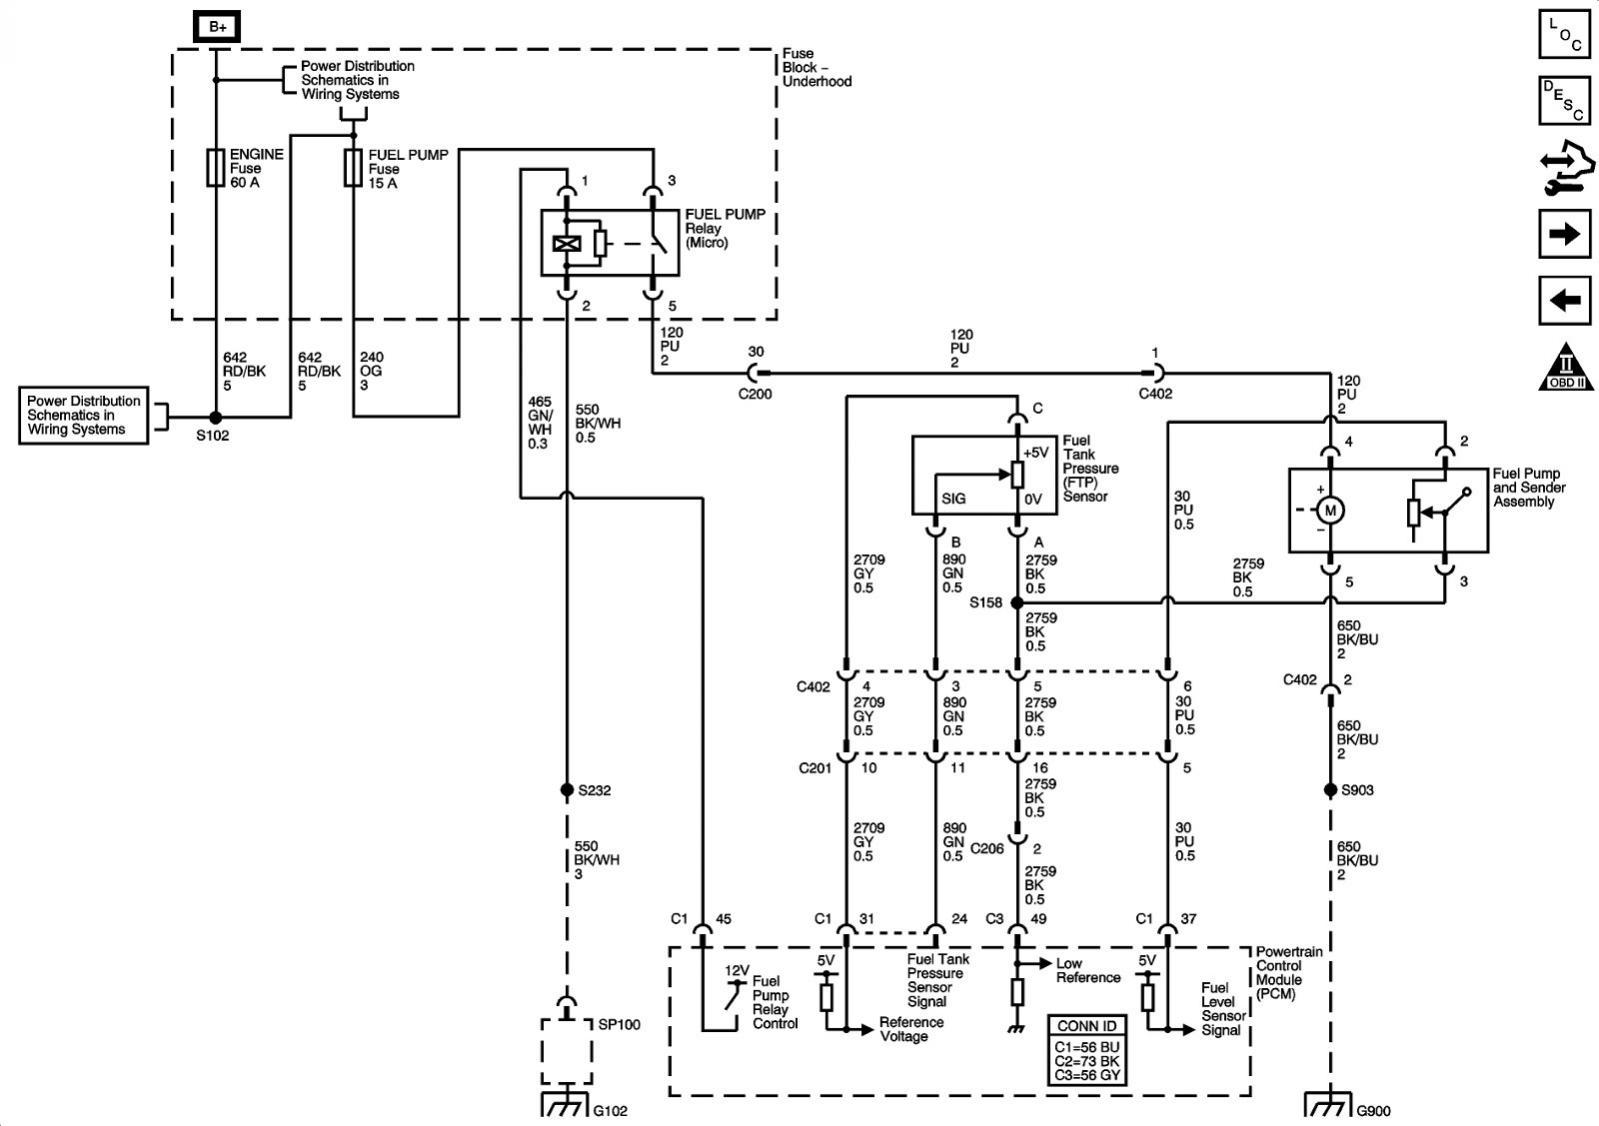 2004 Pontiac Gto Wiring Diagram. Pontiac. Auto Parts